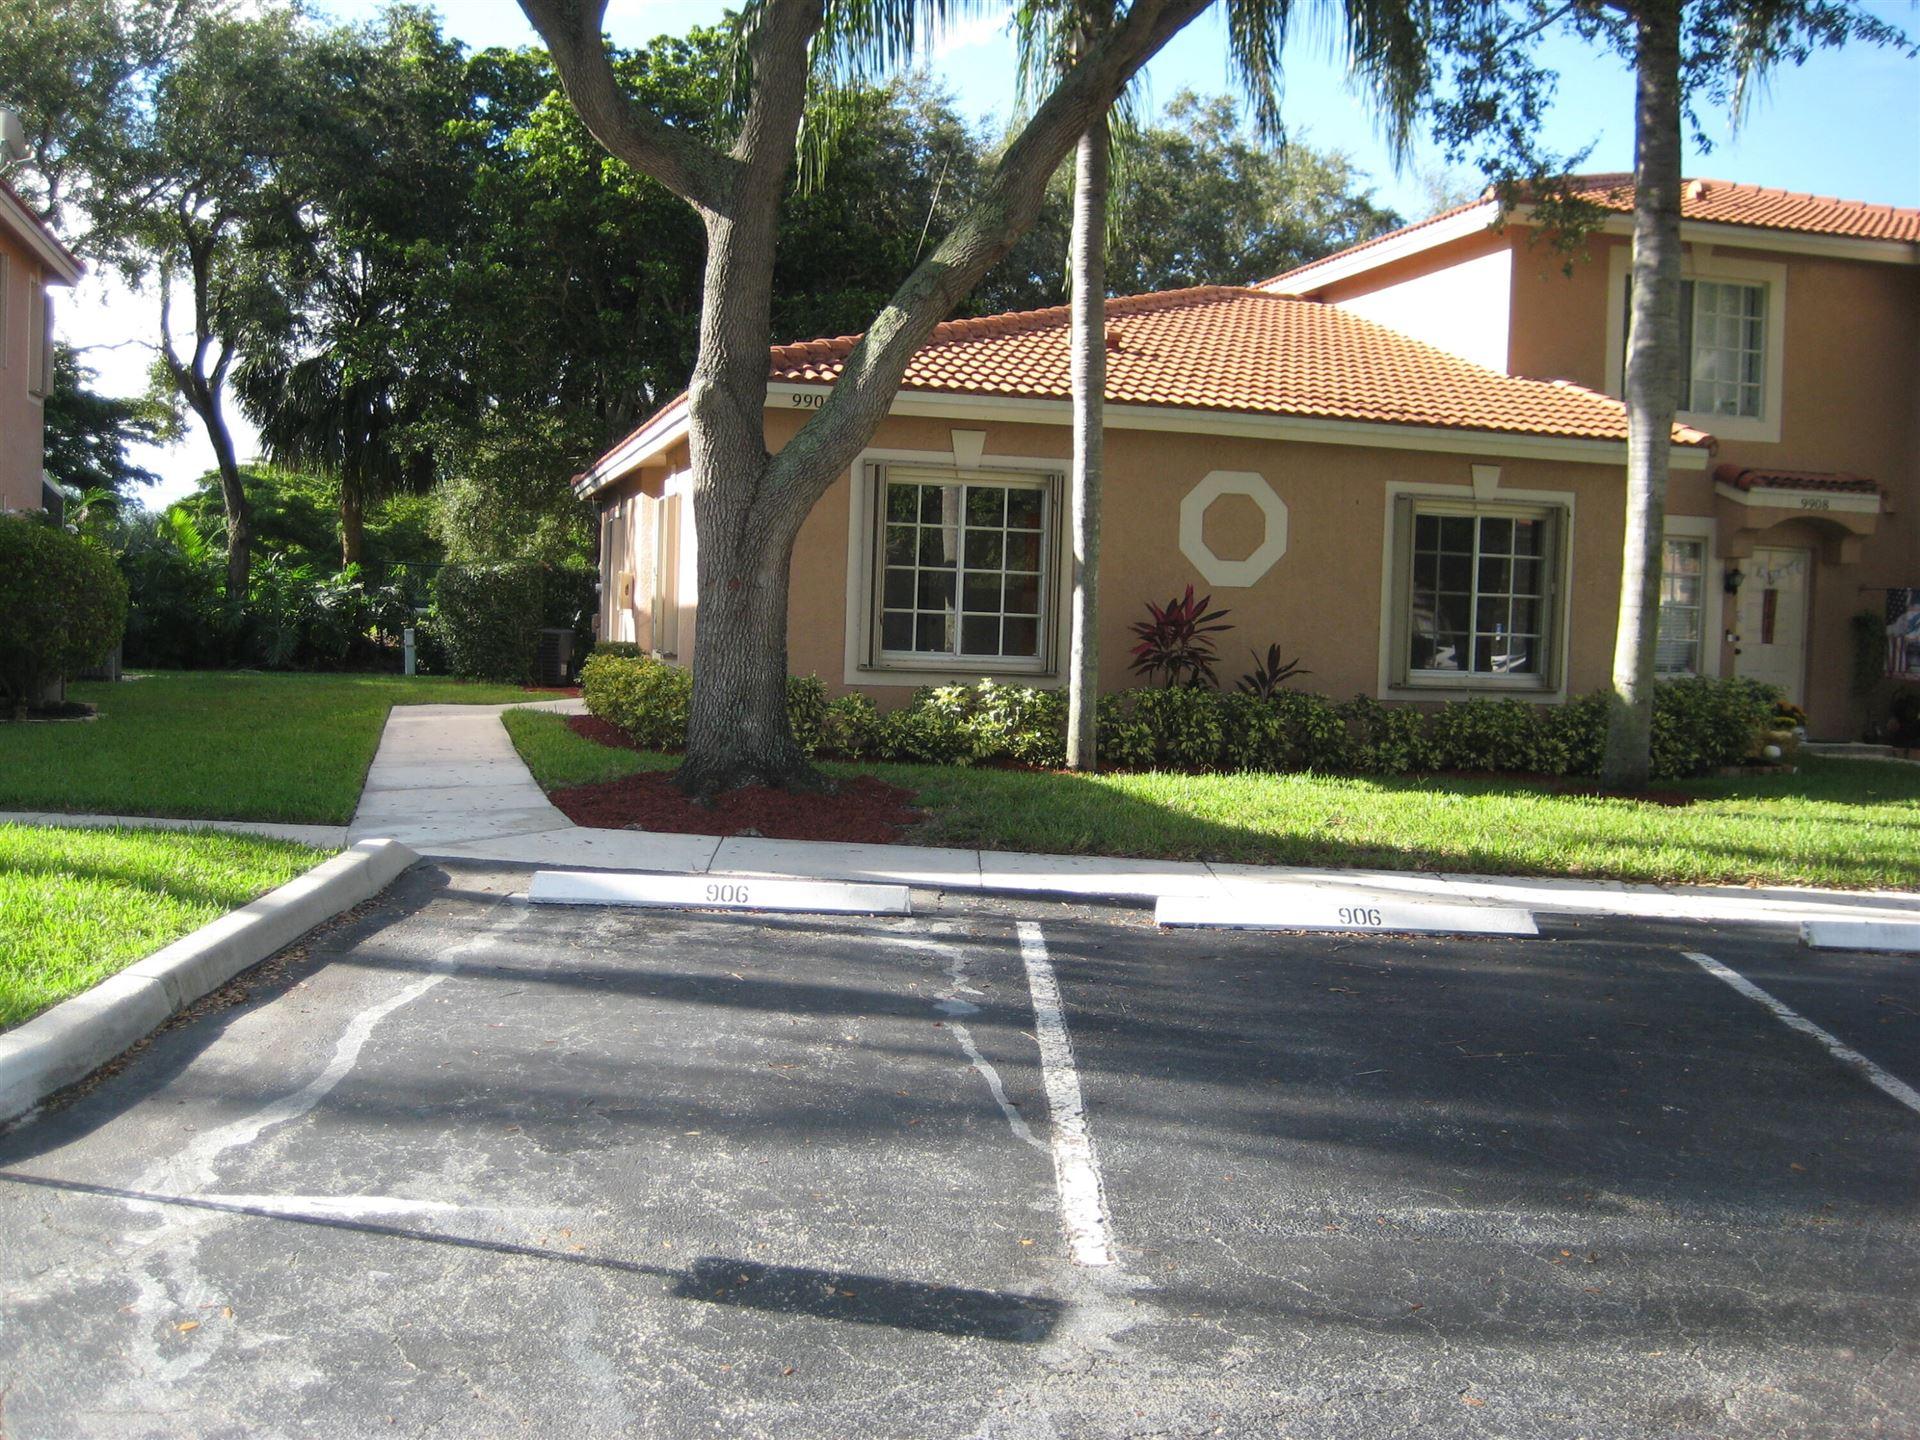 9906 Kamena Circle, Boynton Beach, FL 33436 - MLS#: RX-10752363